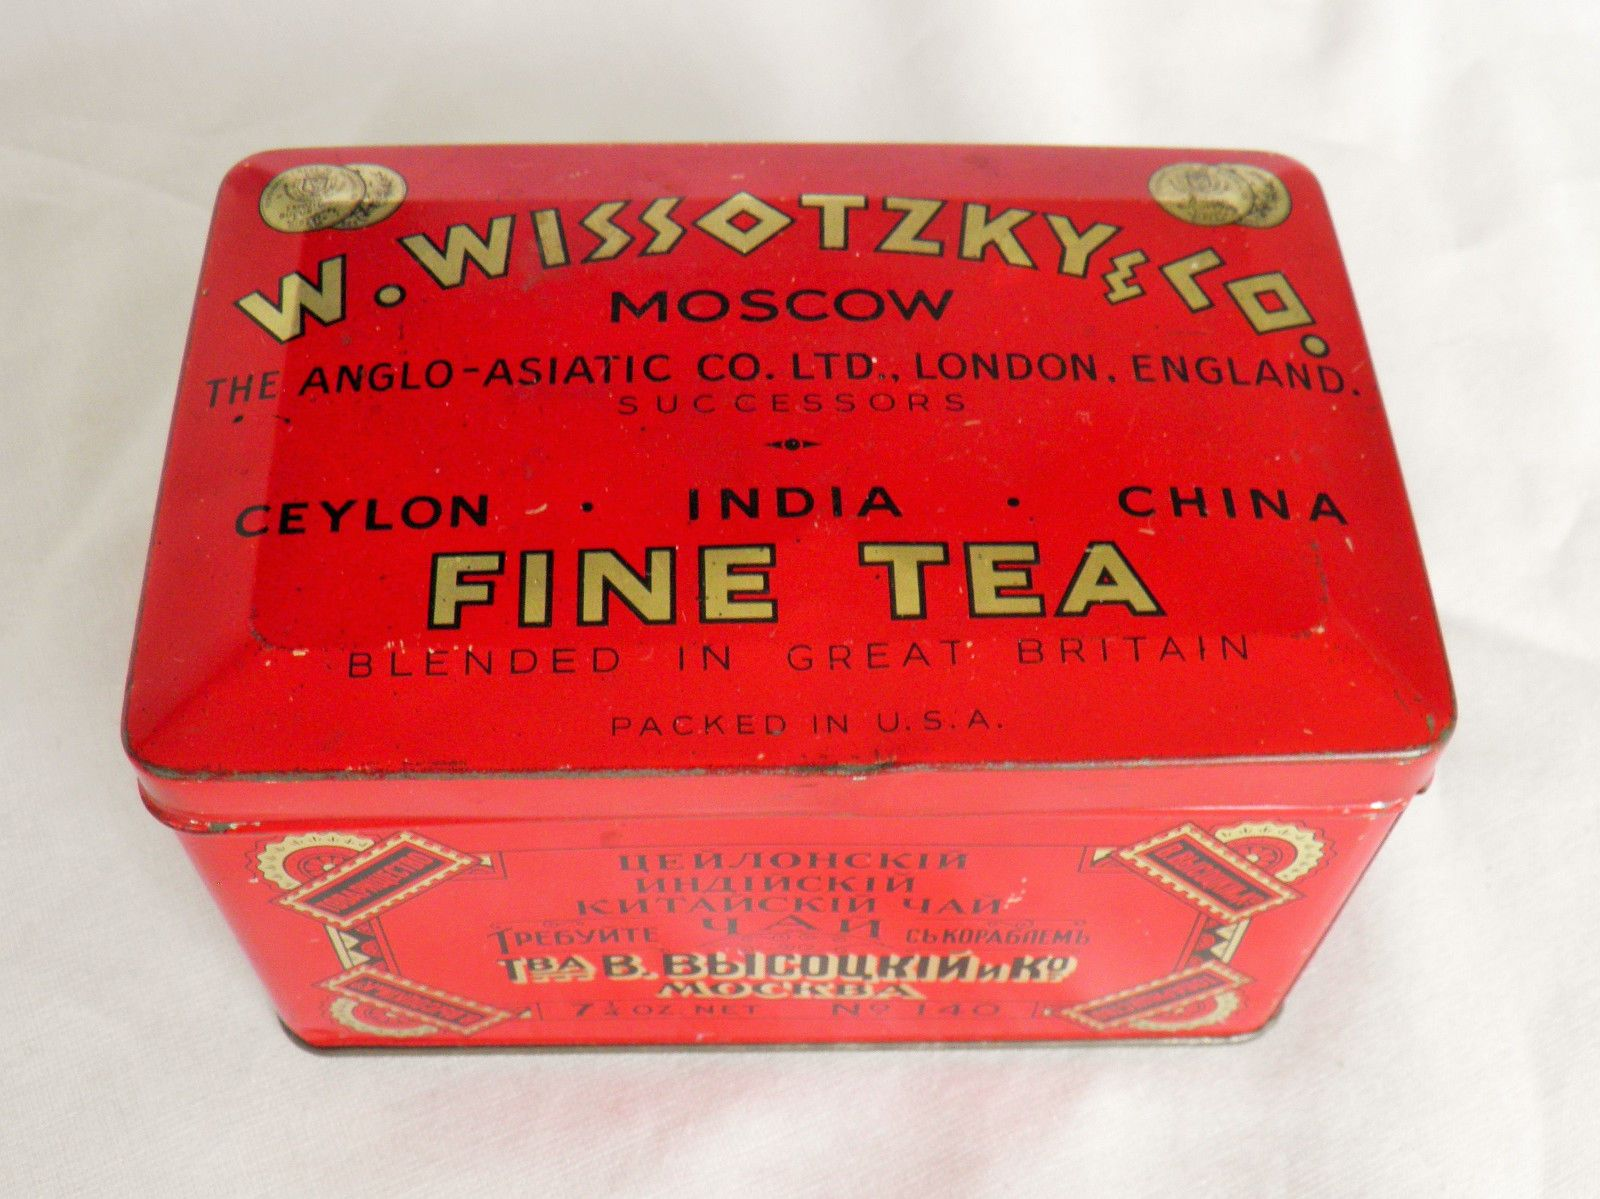 W Wissotzky Russian Tea Tin Can Red Gold Trim Metal Container 1940 S Tea Tins Tea Tin Boxes Russian Tea